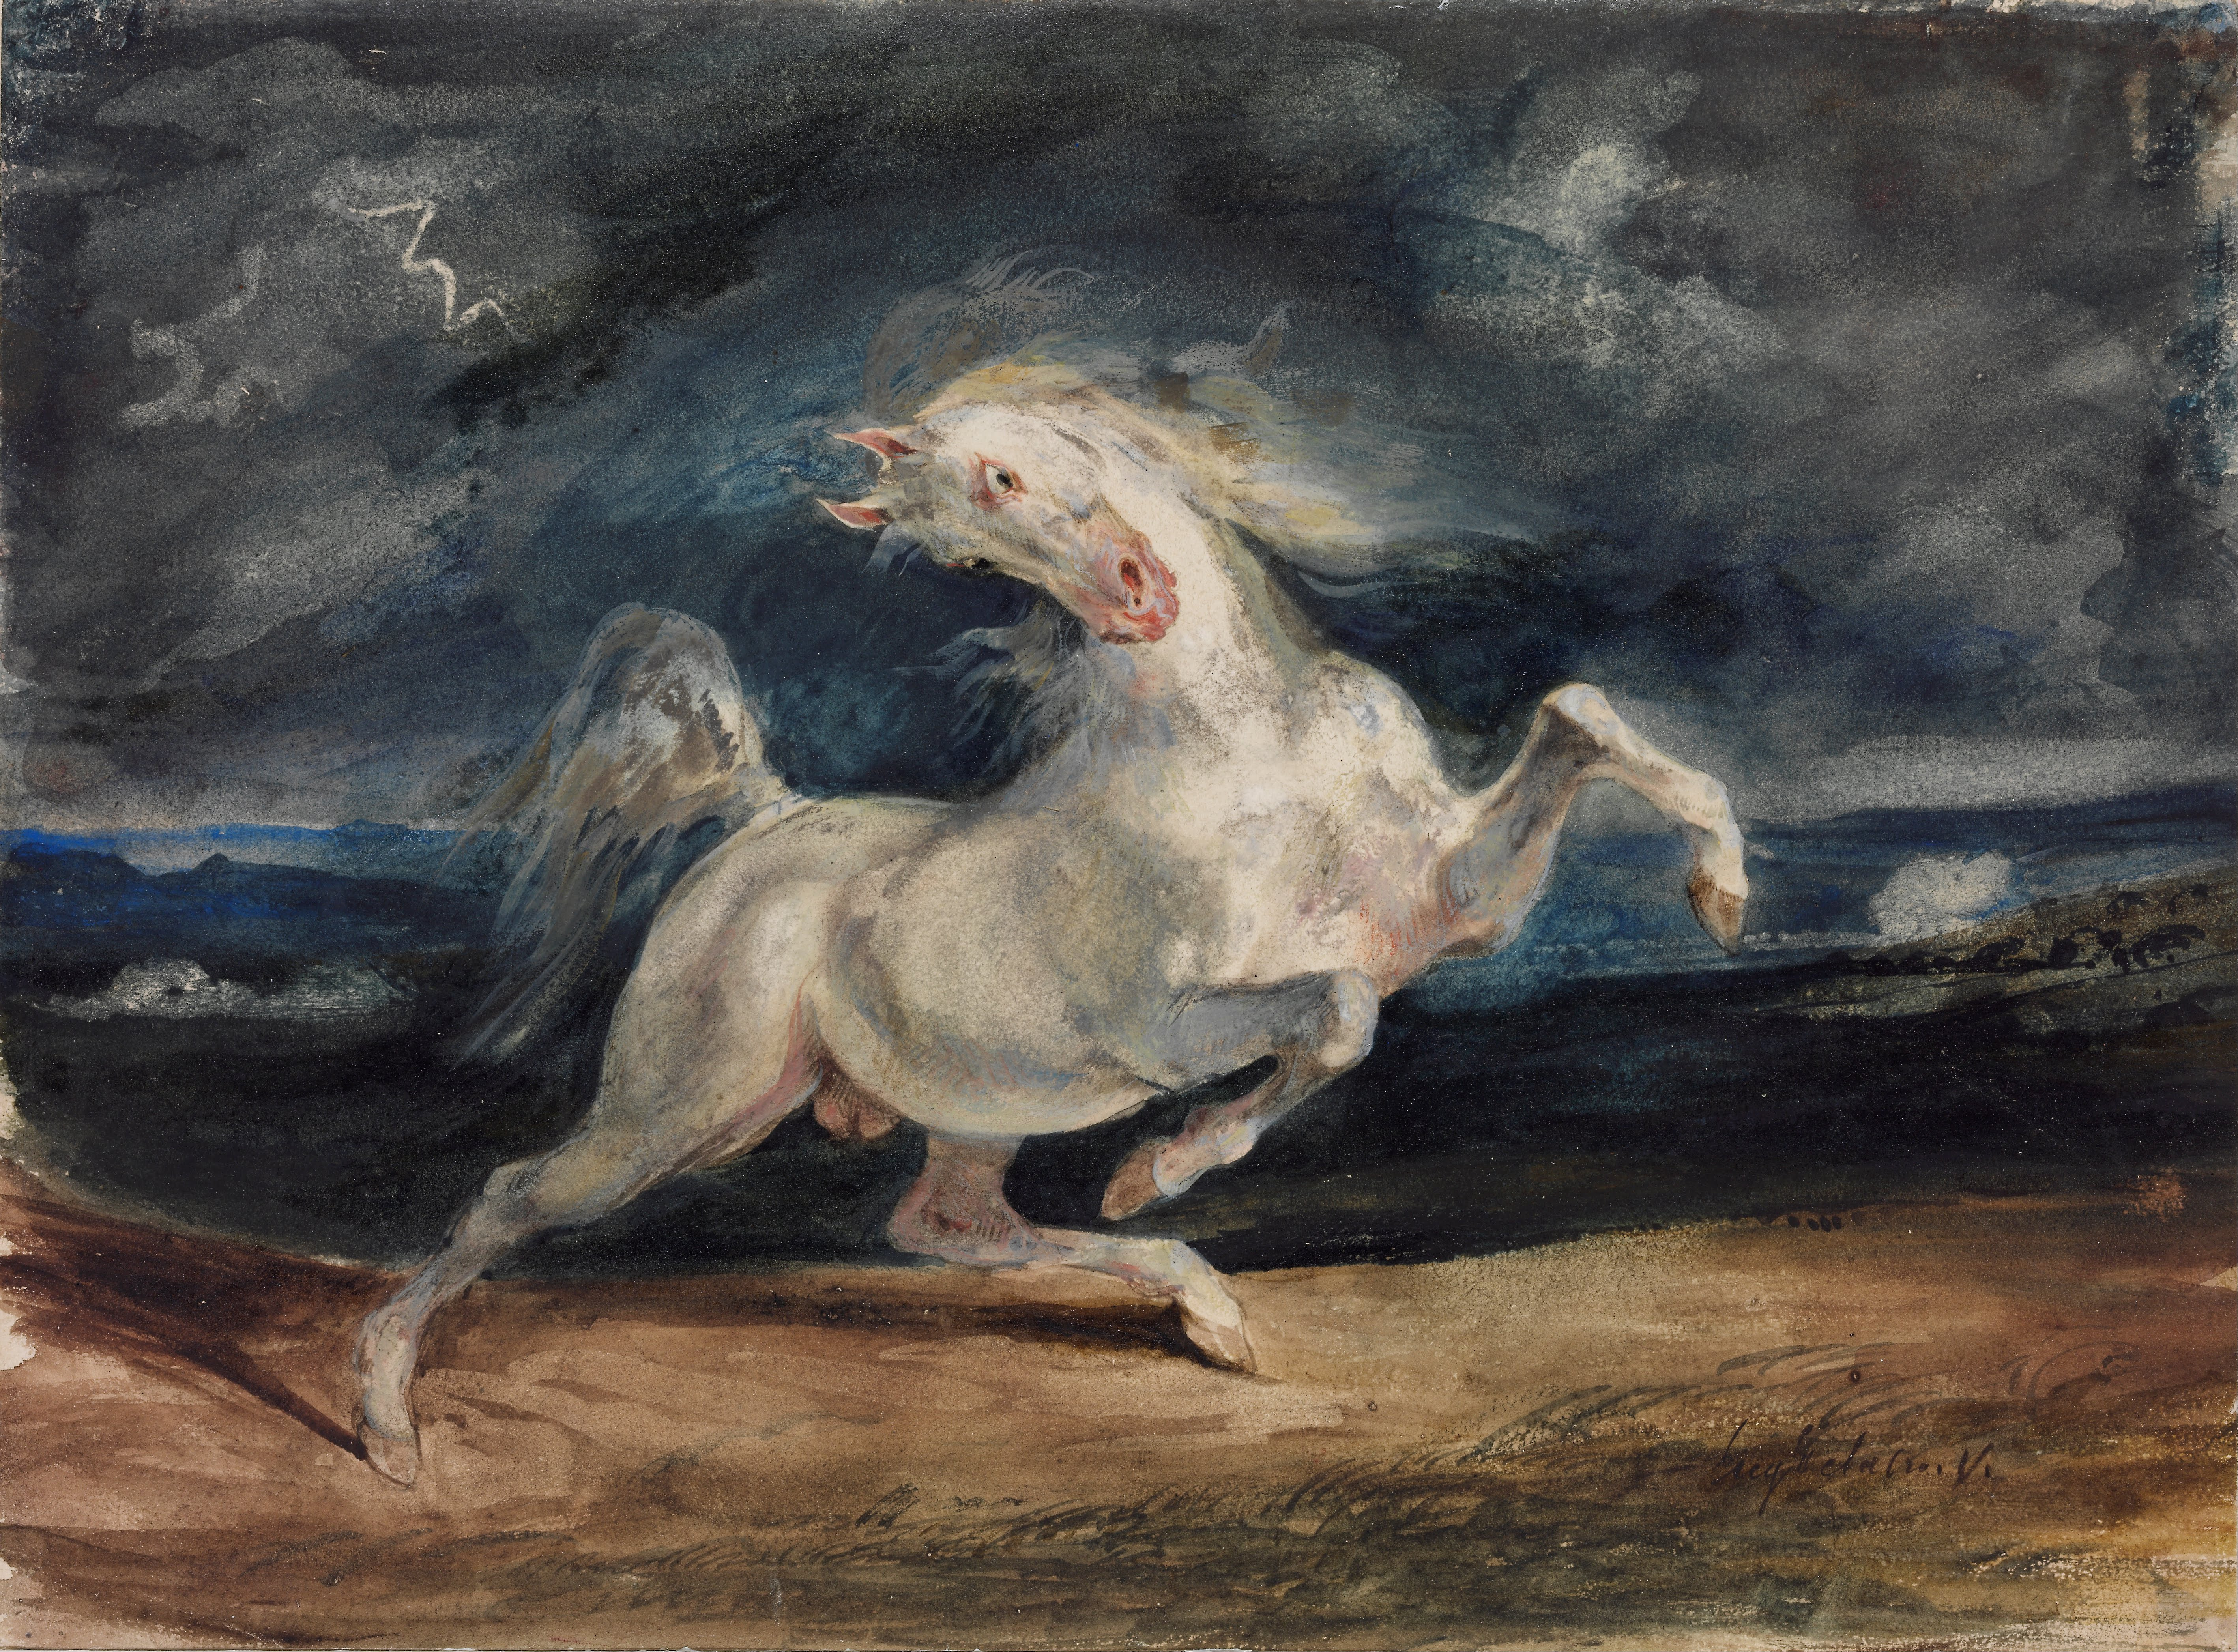 Eugène Delacroix - Horse Frightened by Lightning (c.1829)